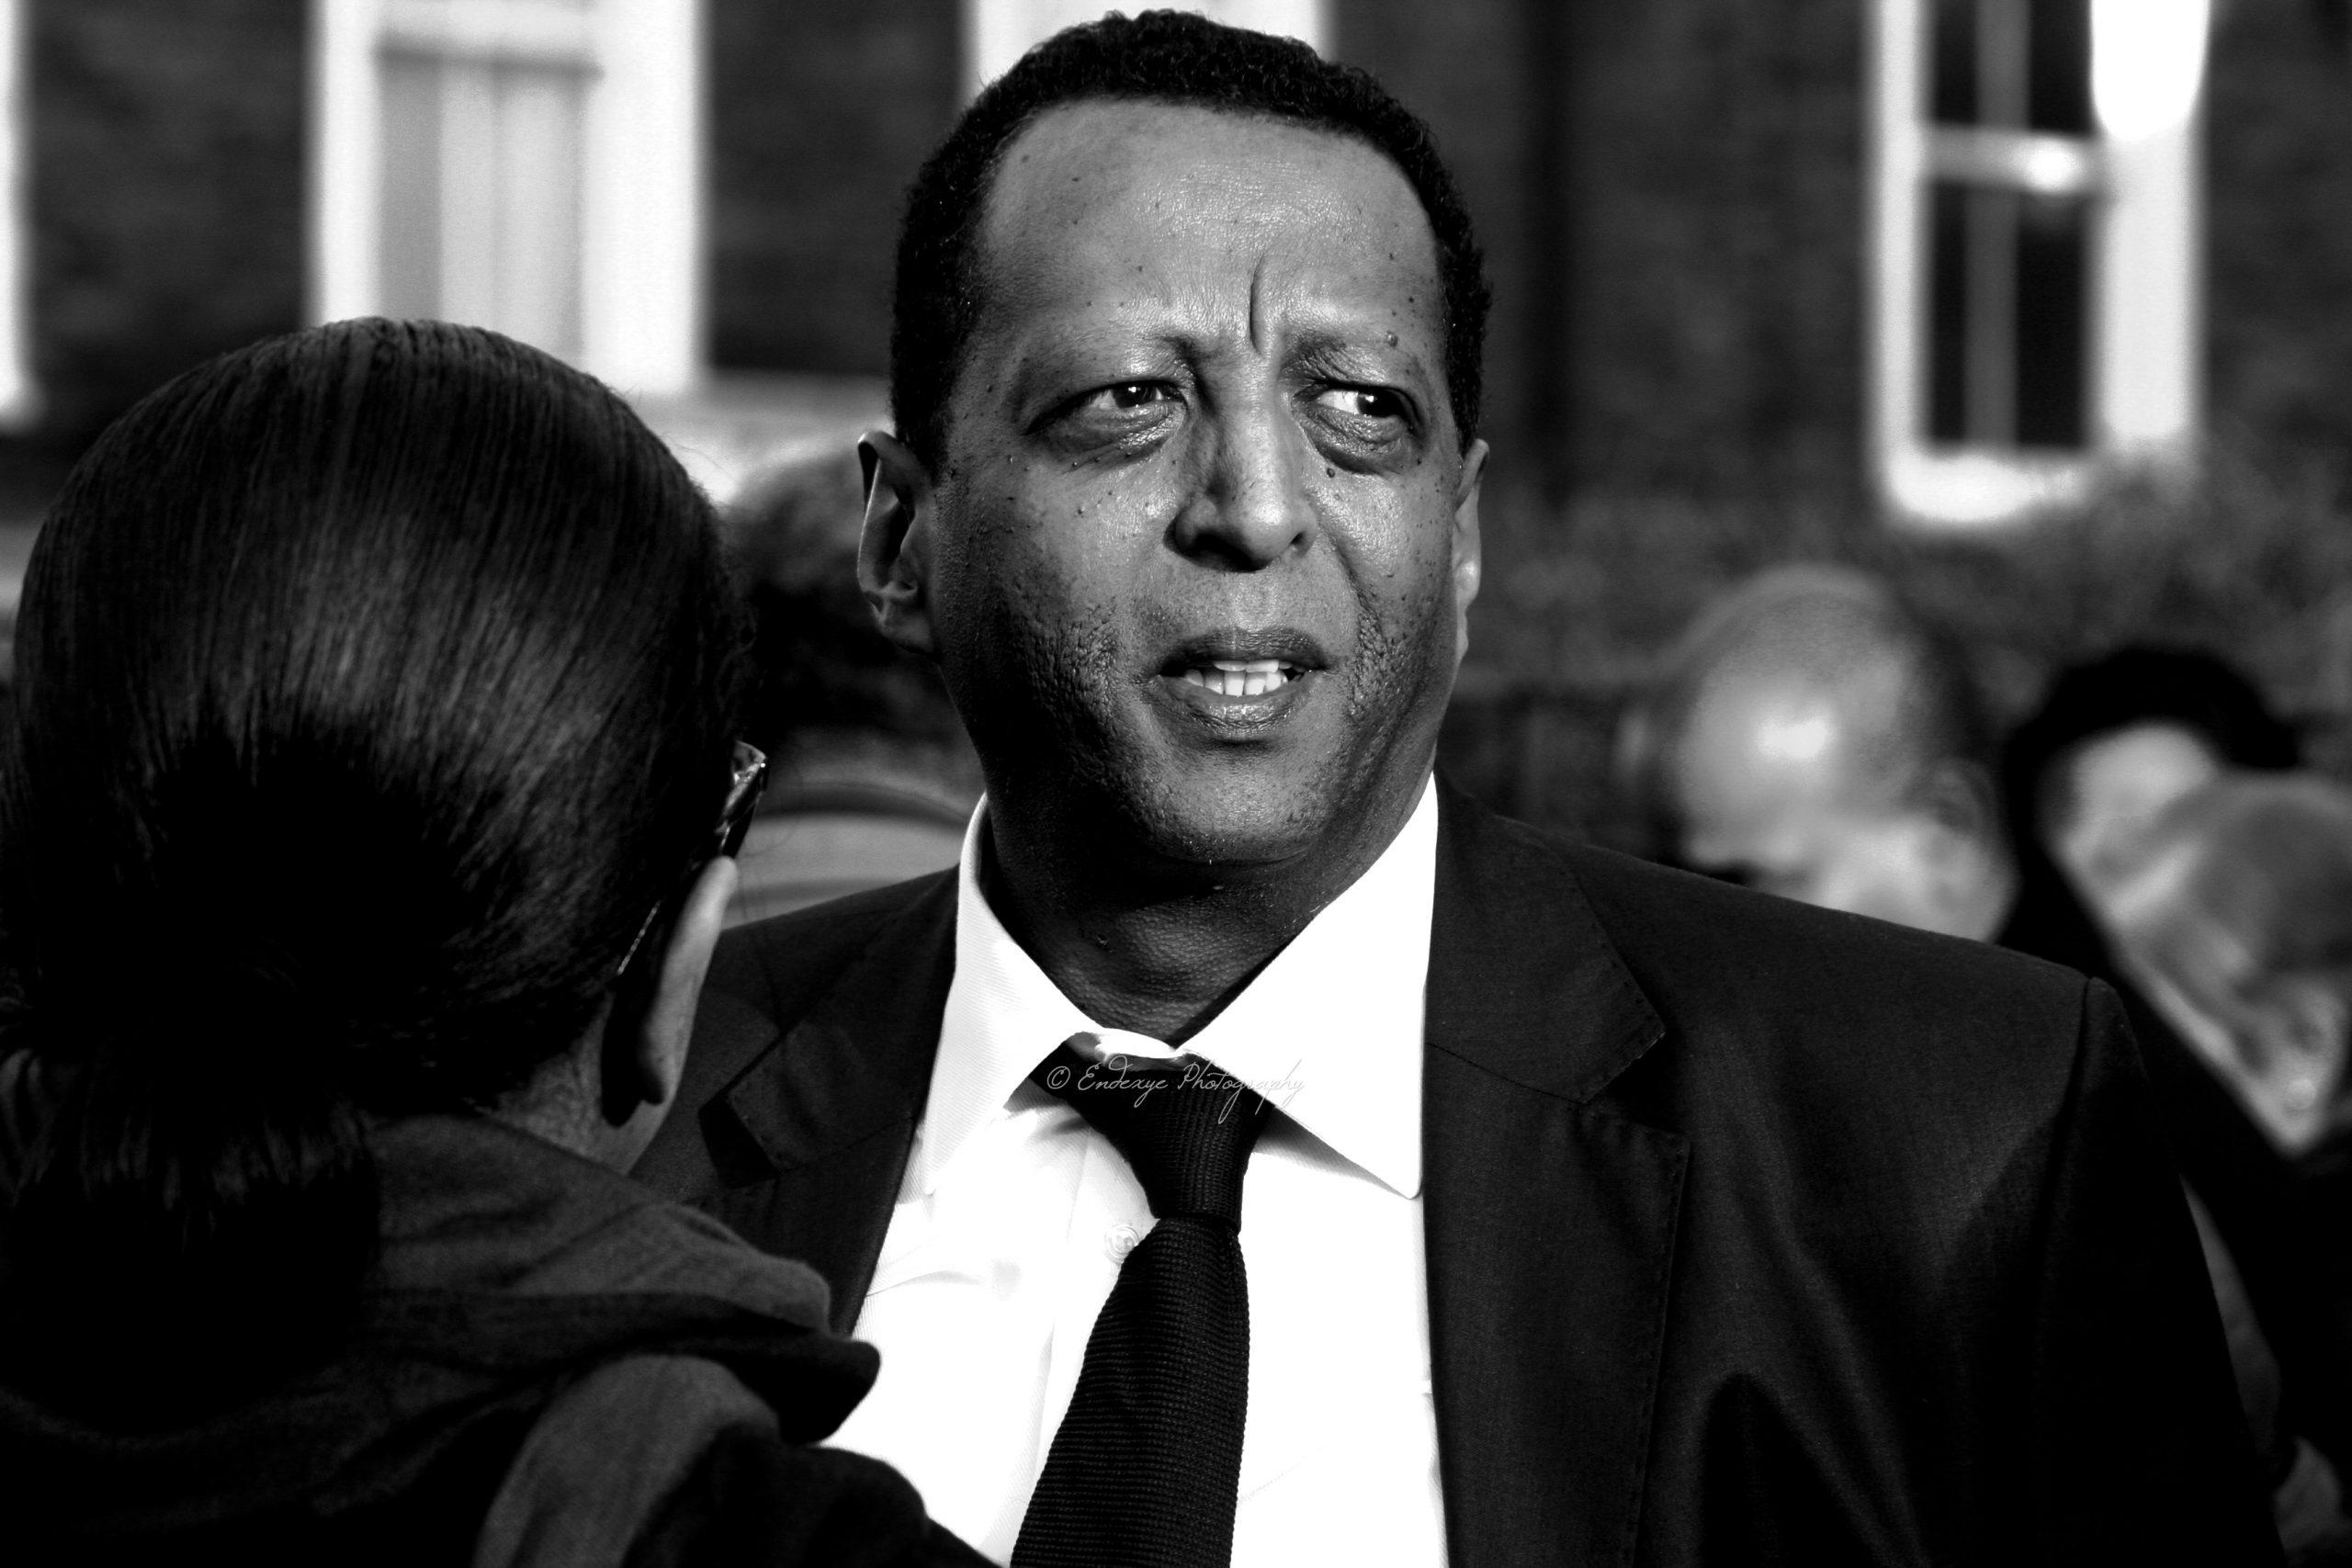 Member of the royal family of Ethiopia Lij Sebastianos Samson Beyene Funeral Services was held in London on 24 Aug 2021